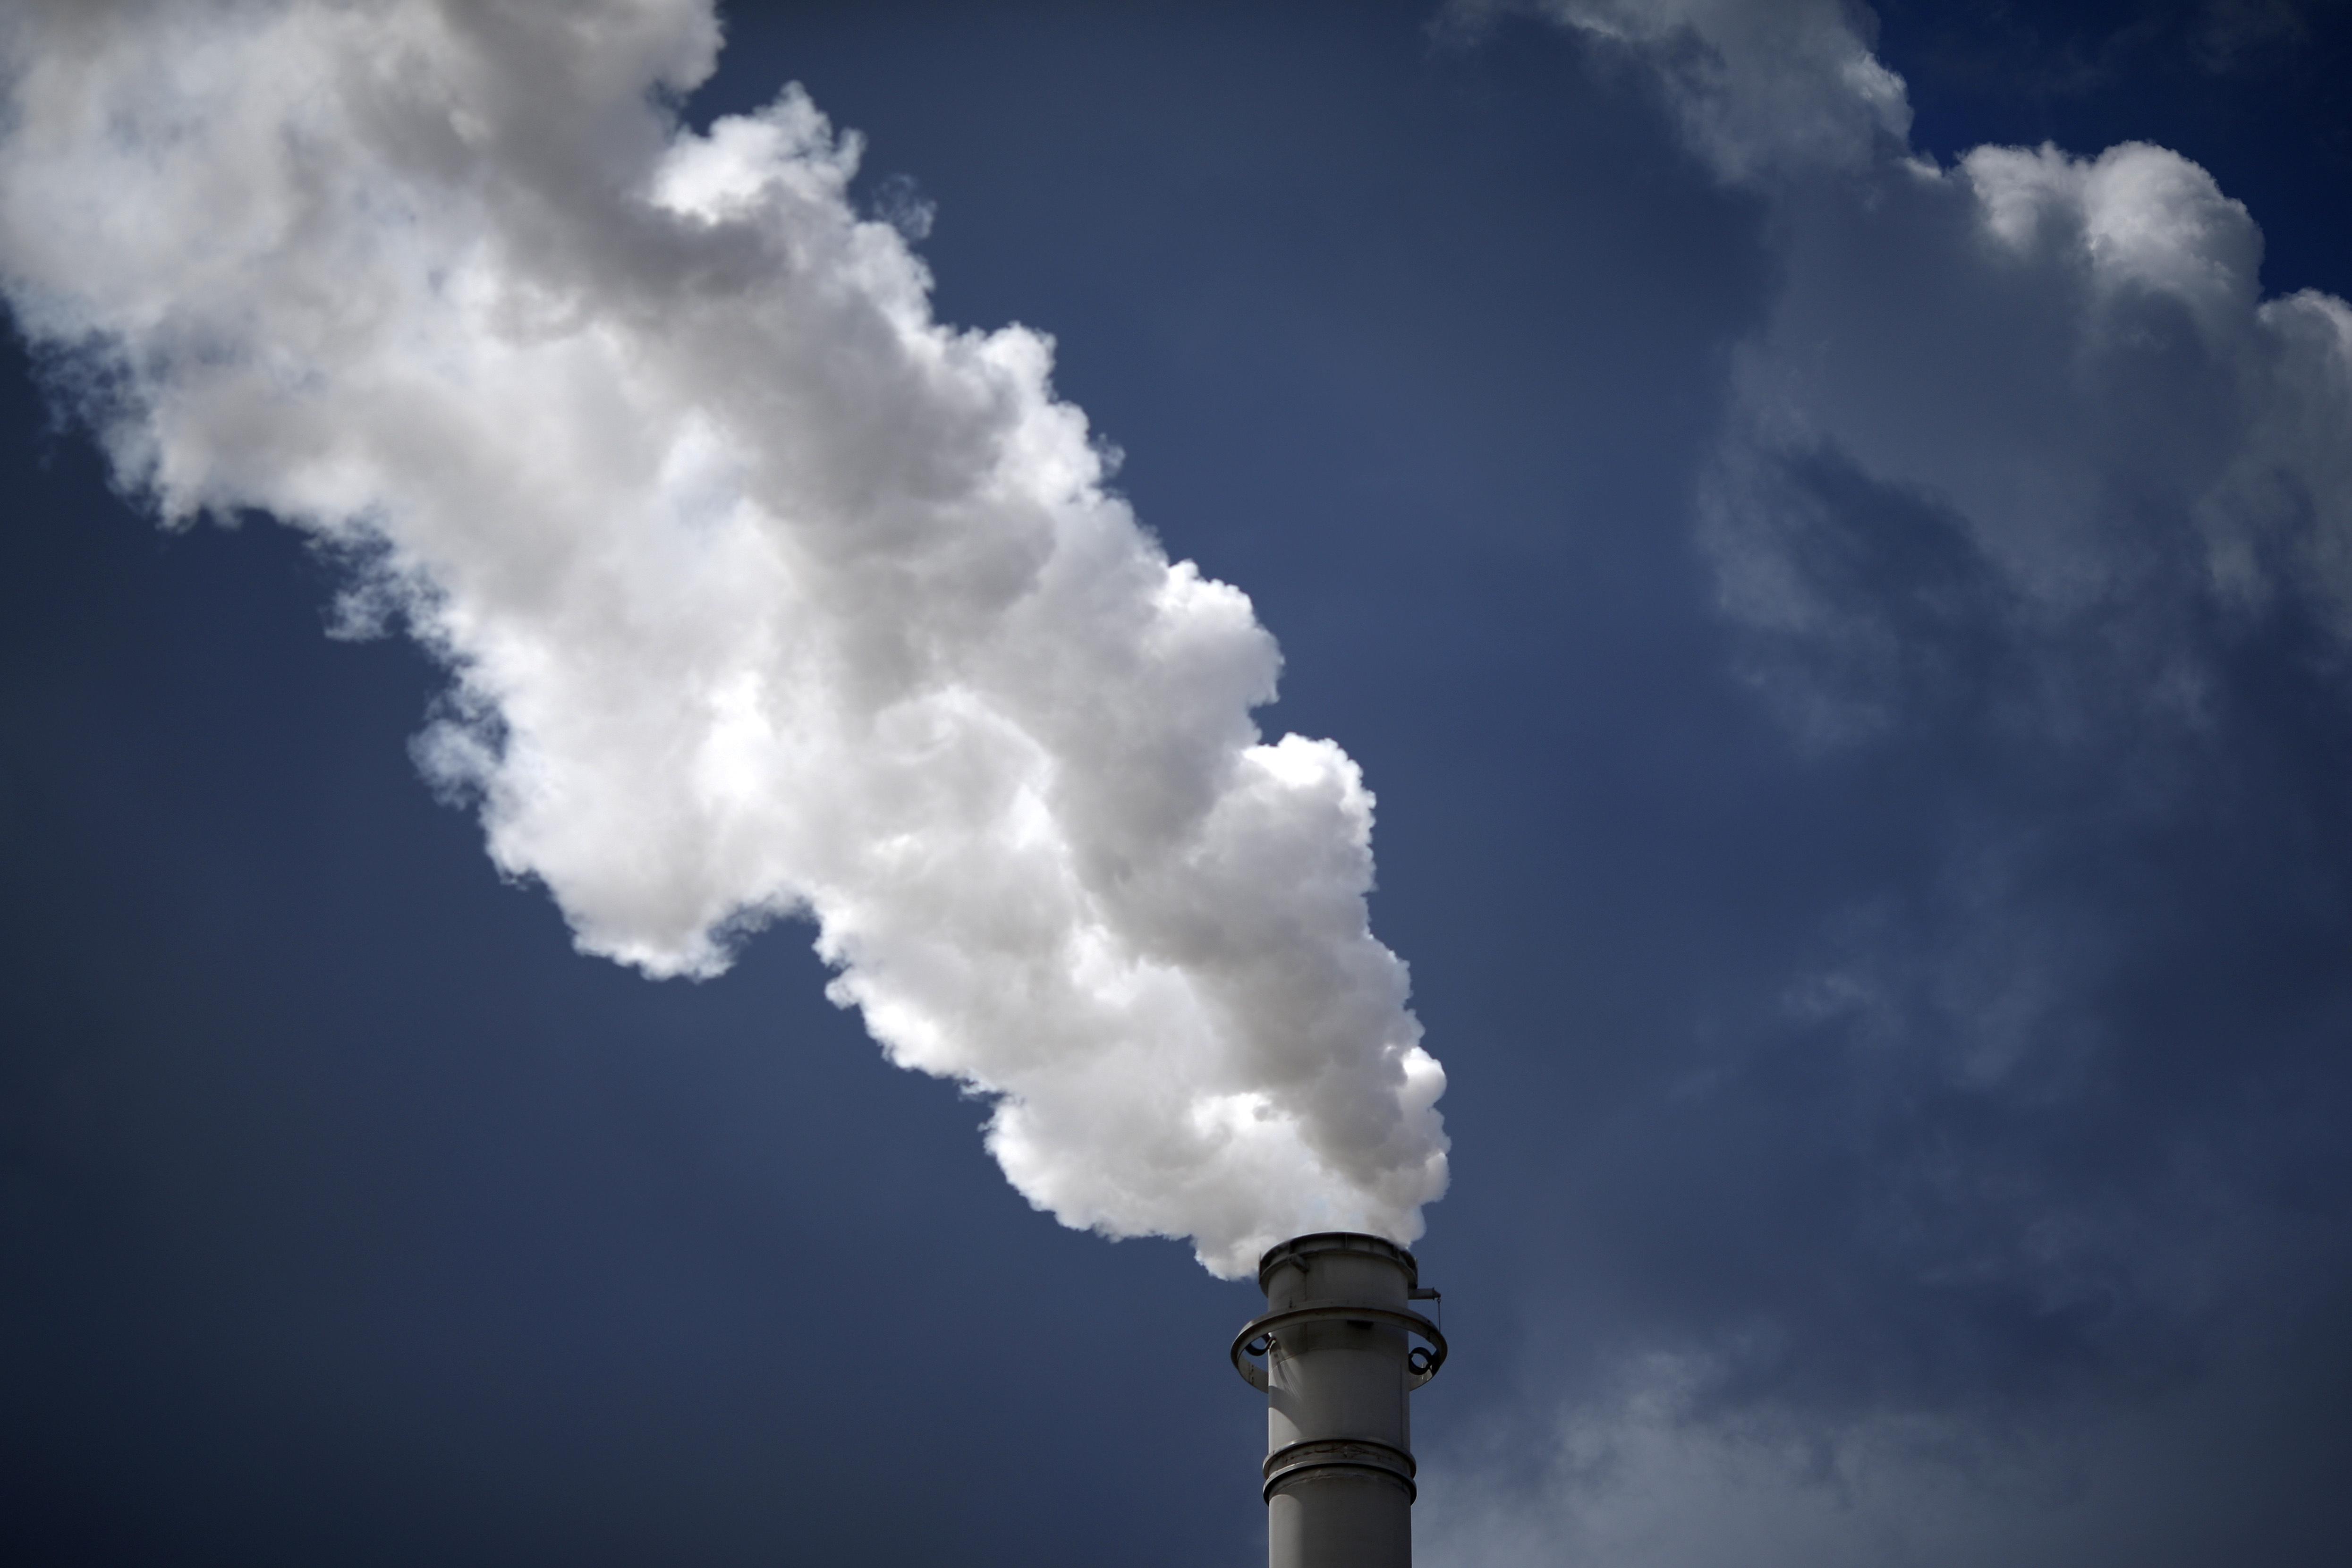 Steam is released from PDVSA's U.S. unit Citgo Petroleum refinery in Sulphur, Louisiana, U.S., June 12, 2018. REUTERS/Jonathan Bachman